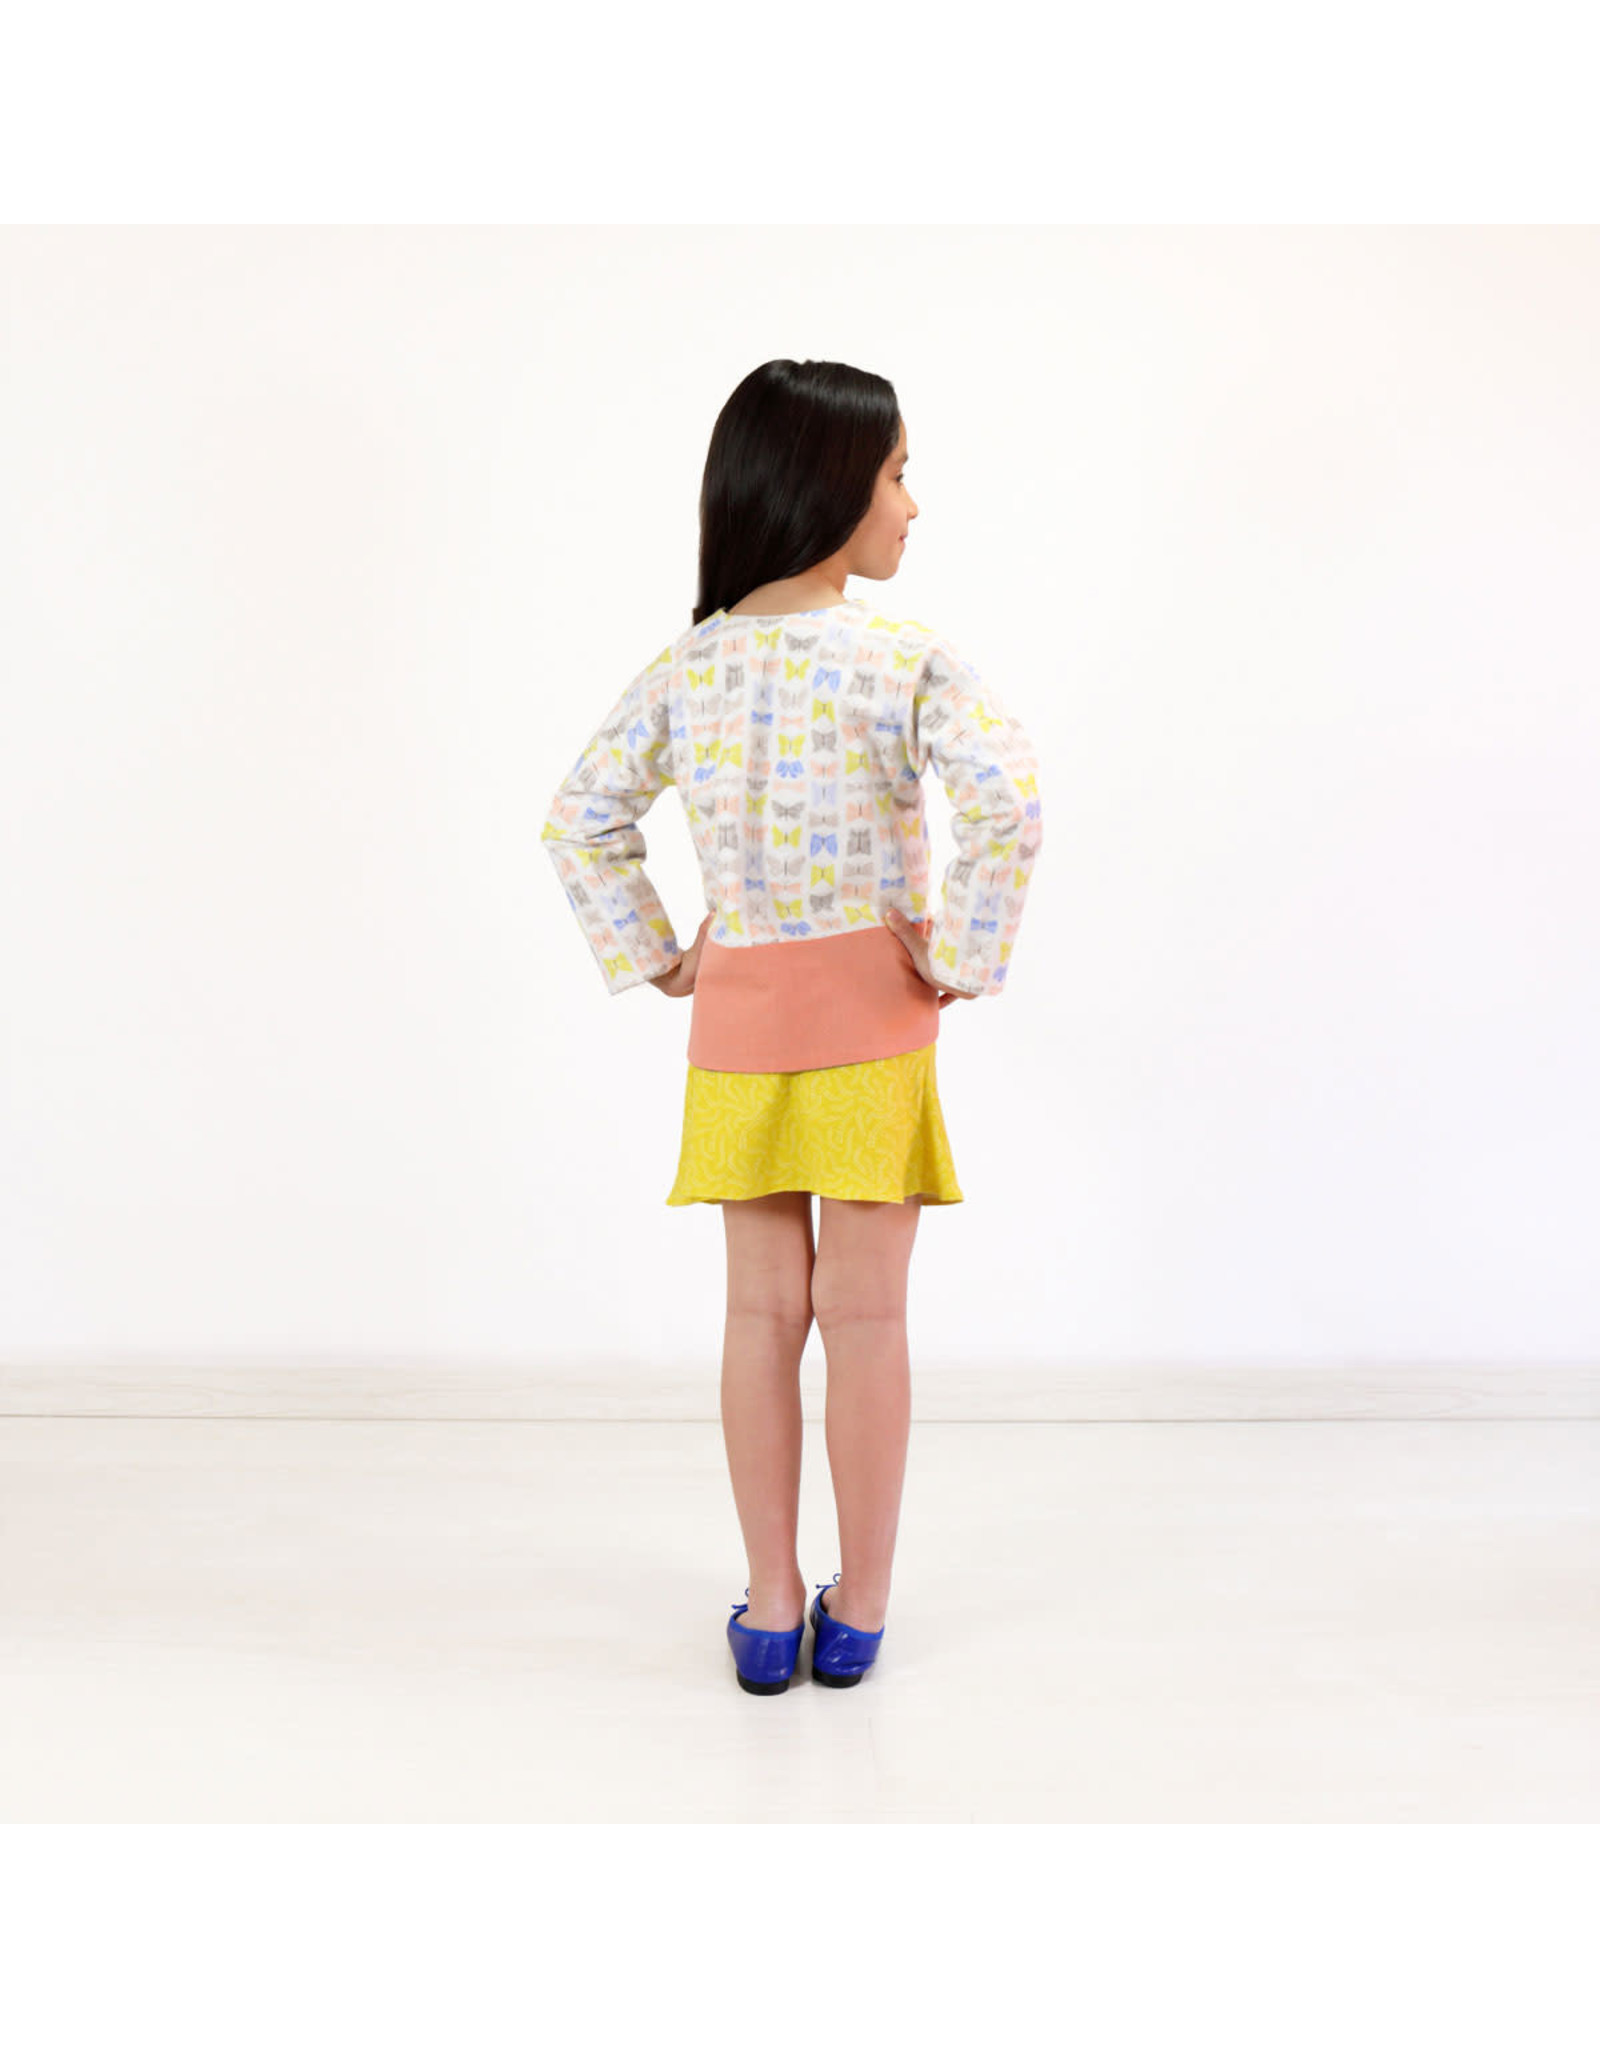 Oliver + S Oliver+S's Double Dutch Jackert + Skirt Pattern - Sizes 6M-12M - 10-12